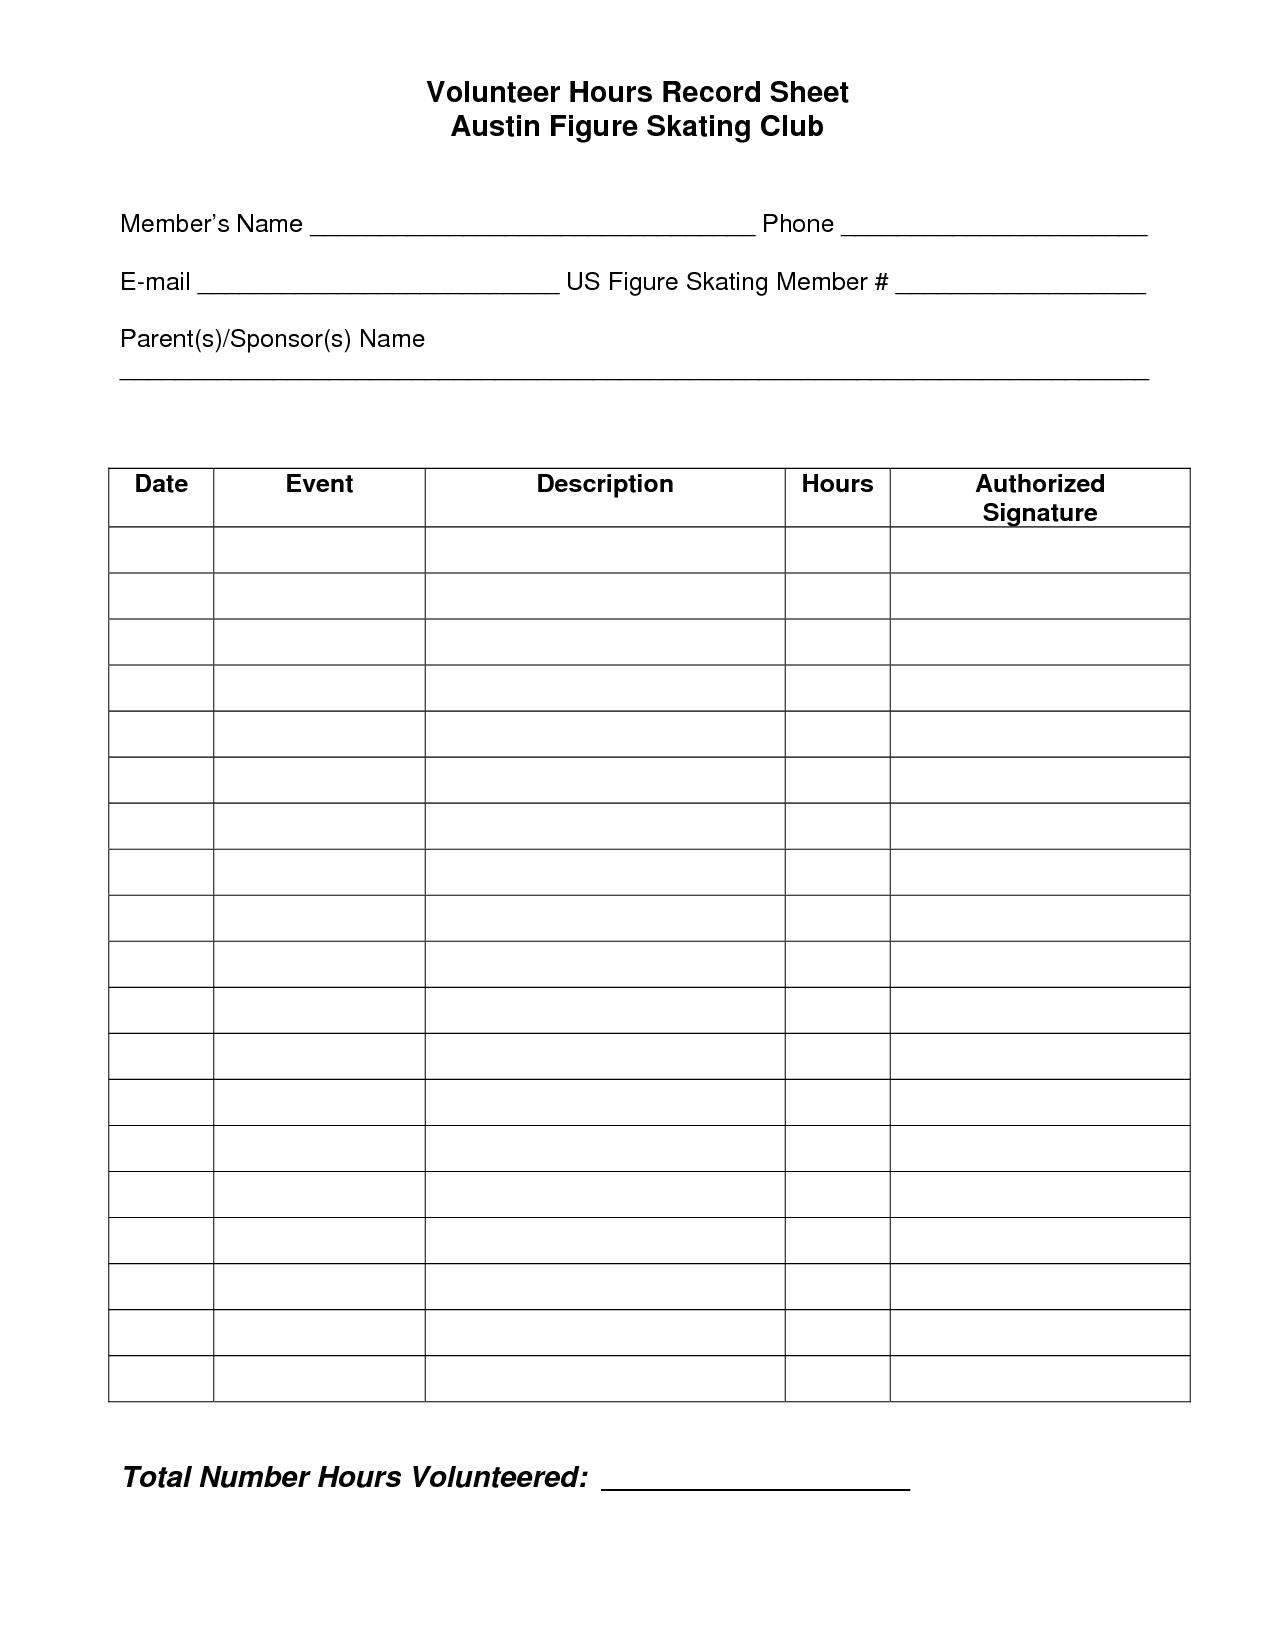 Volunteer Hours Log Sheet Template   Beta Club   Essay Writing Tips - Free Printable Community Service Log Sheet